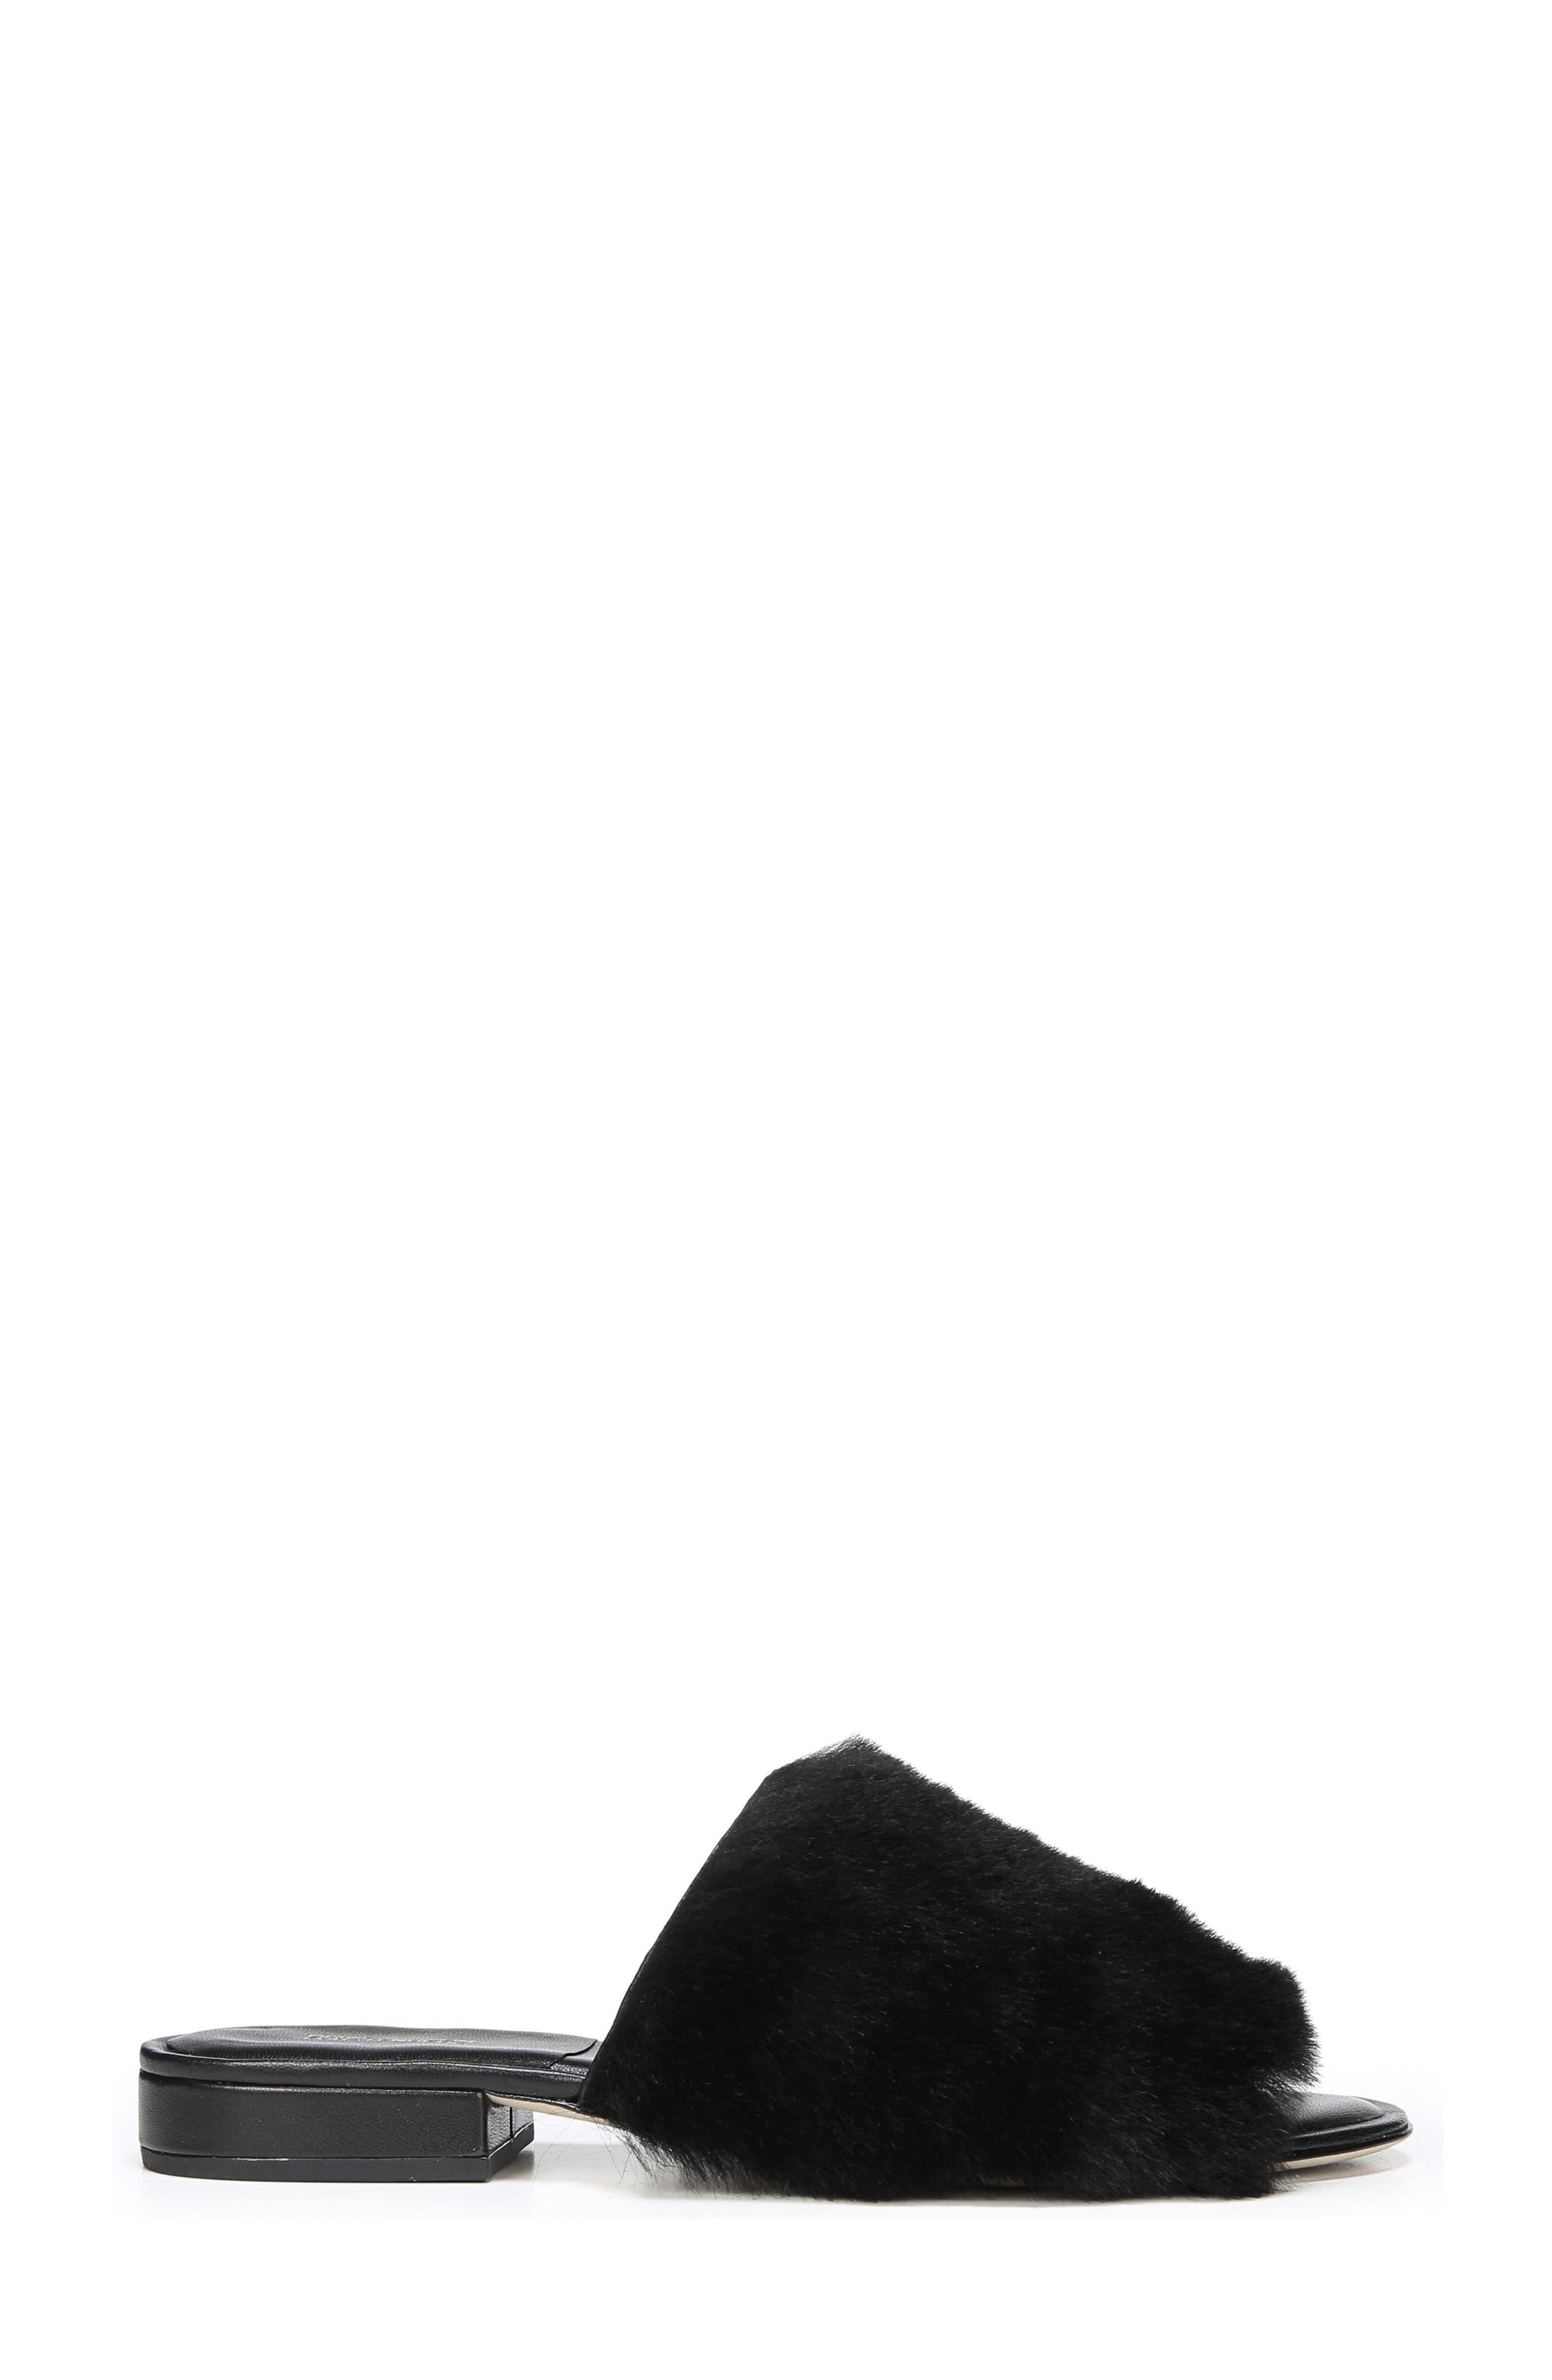 Alternate Image 3  - Diane von Furstenberg Santi Genuine Shearling Slide Sandal (Women)